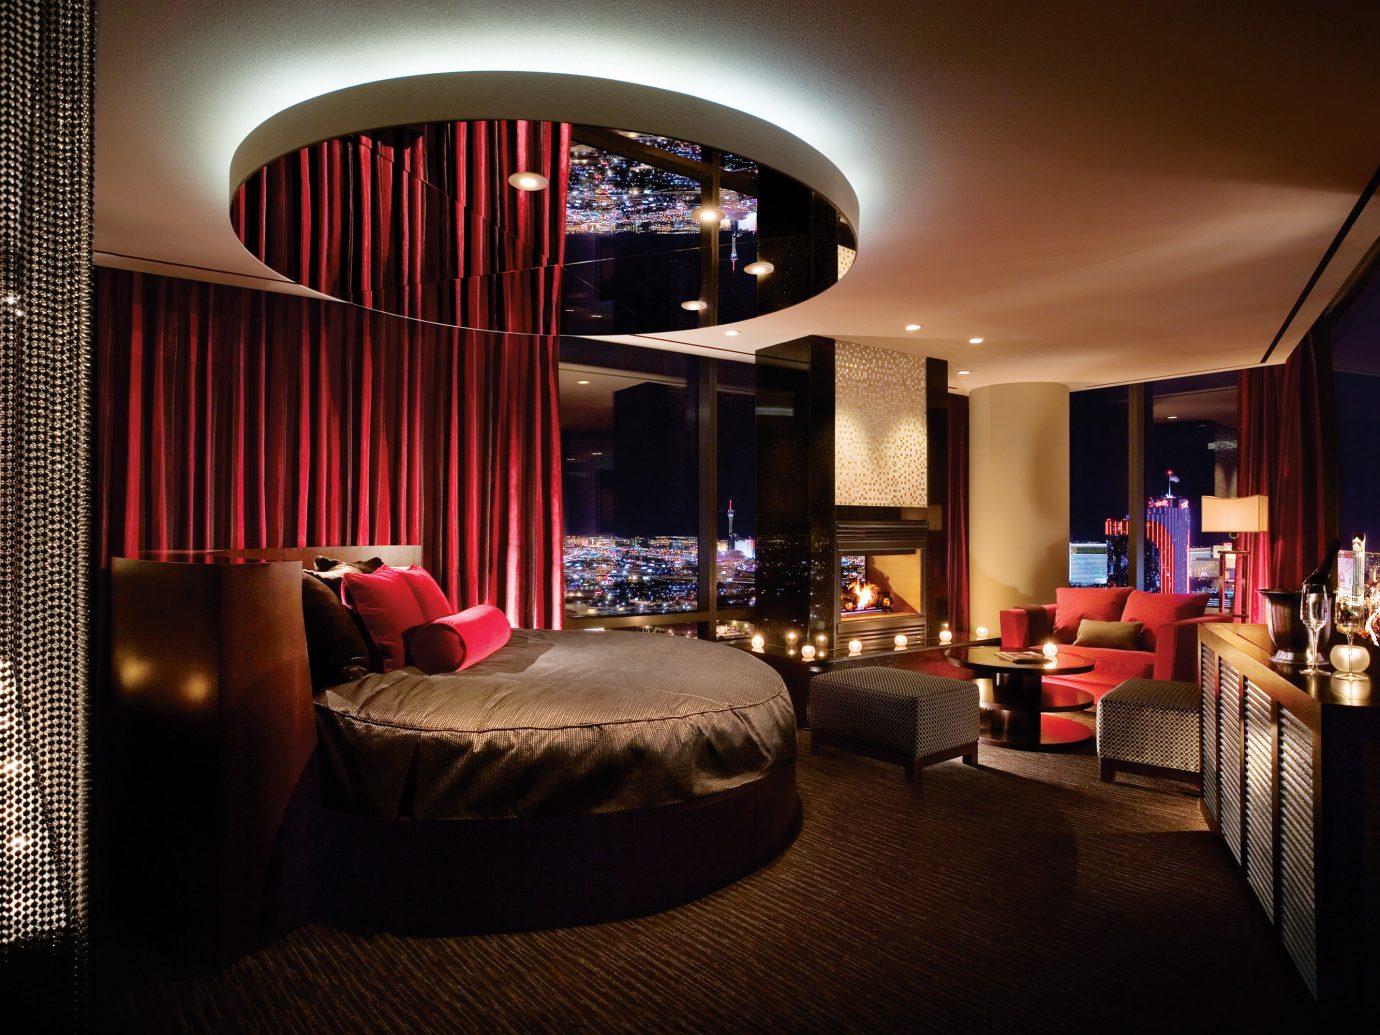 Bedroom in the Sky Villa, Palms Casino Resort in Las Vegas